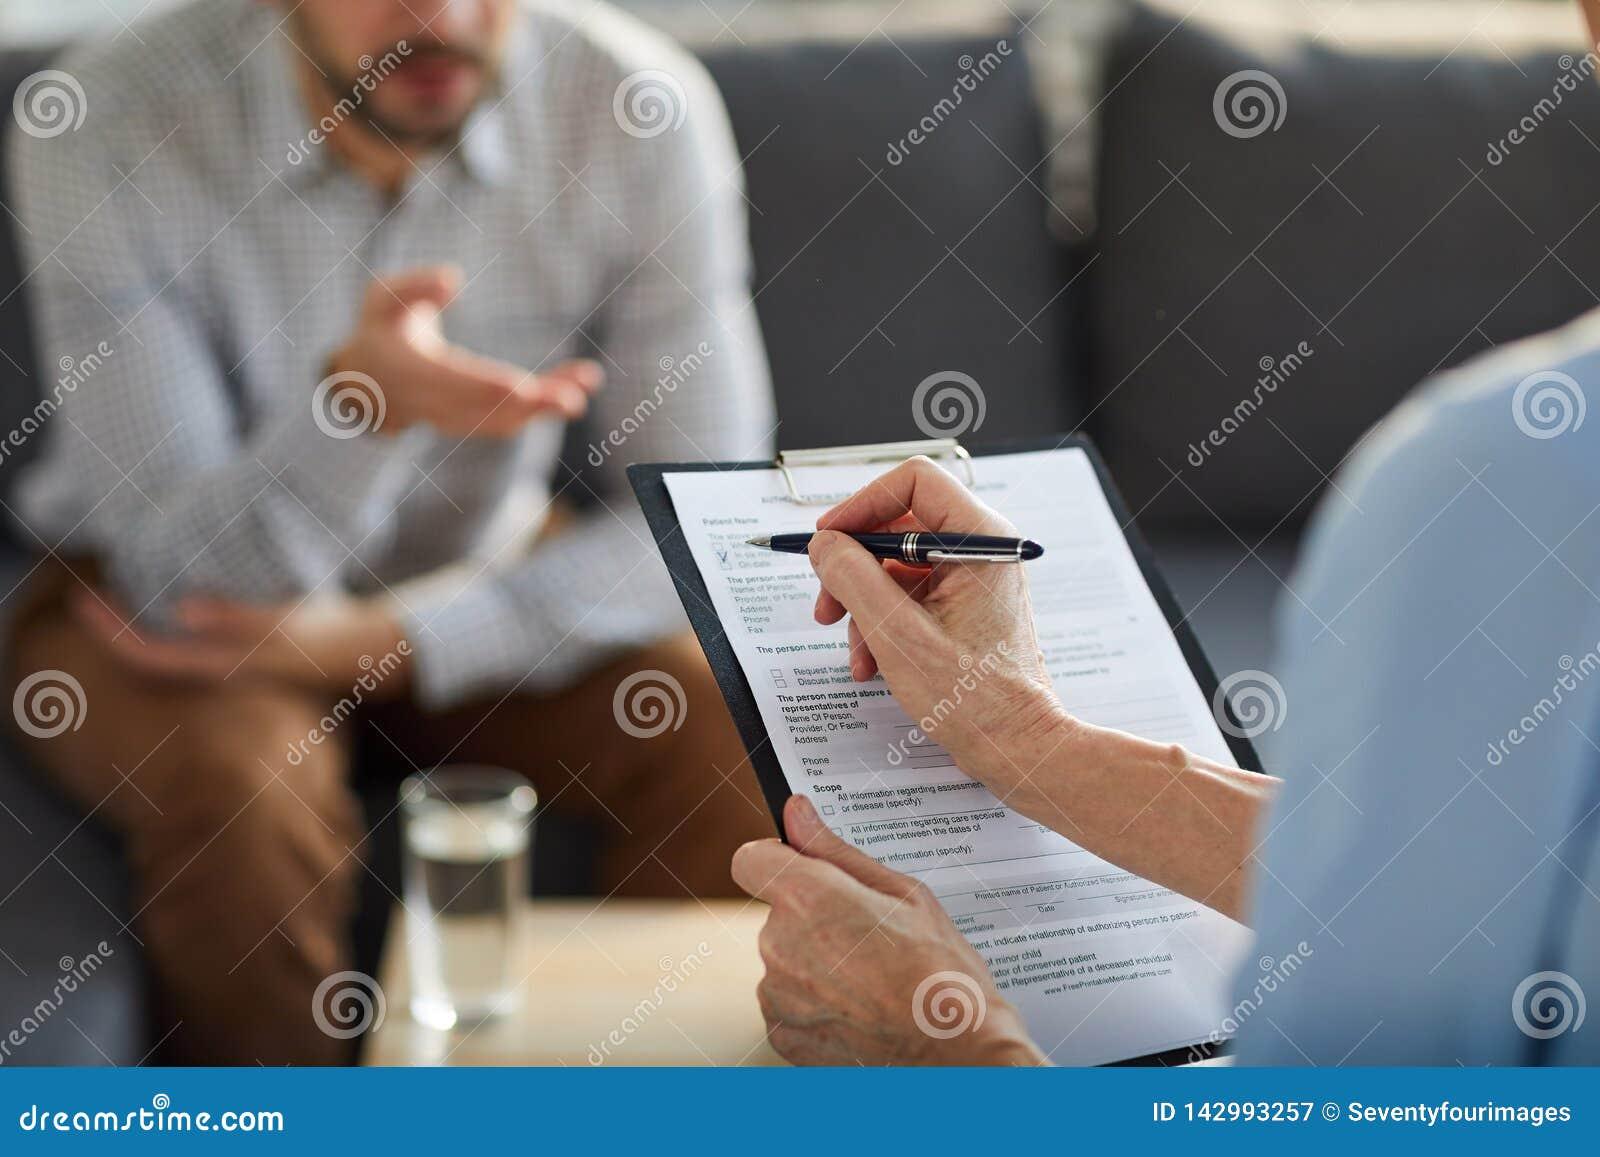 Putting tick in document